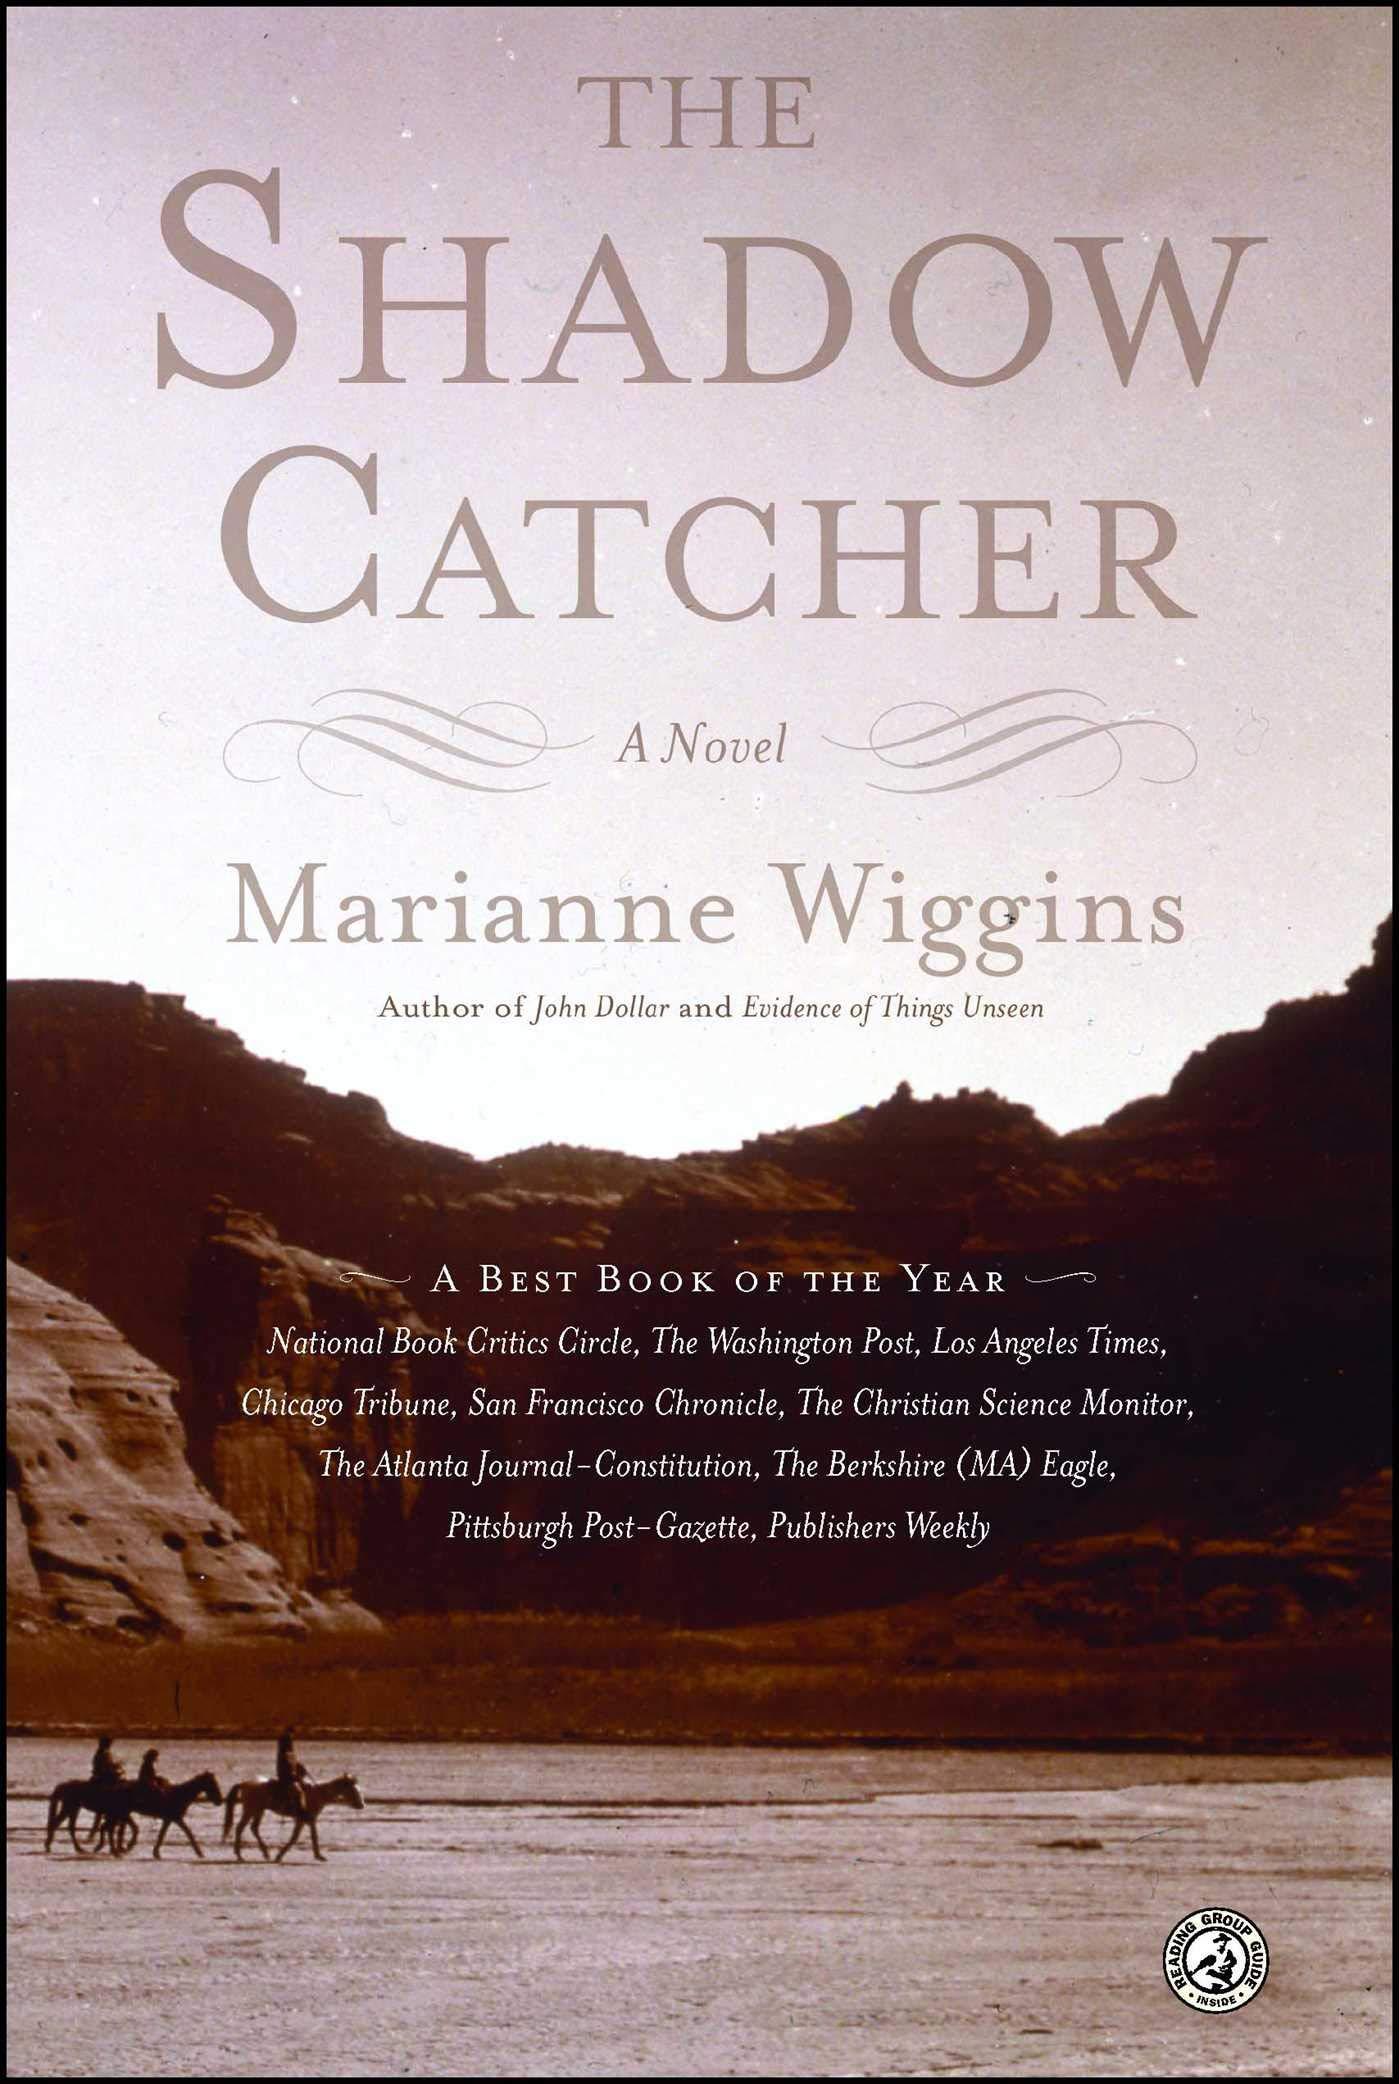 Amazon.com: The Shadow Catcher: A Novel (9780743265218): Wiggins, Marianne:  Books